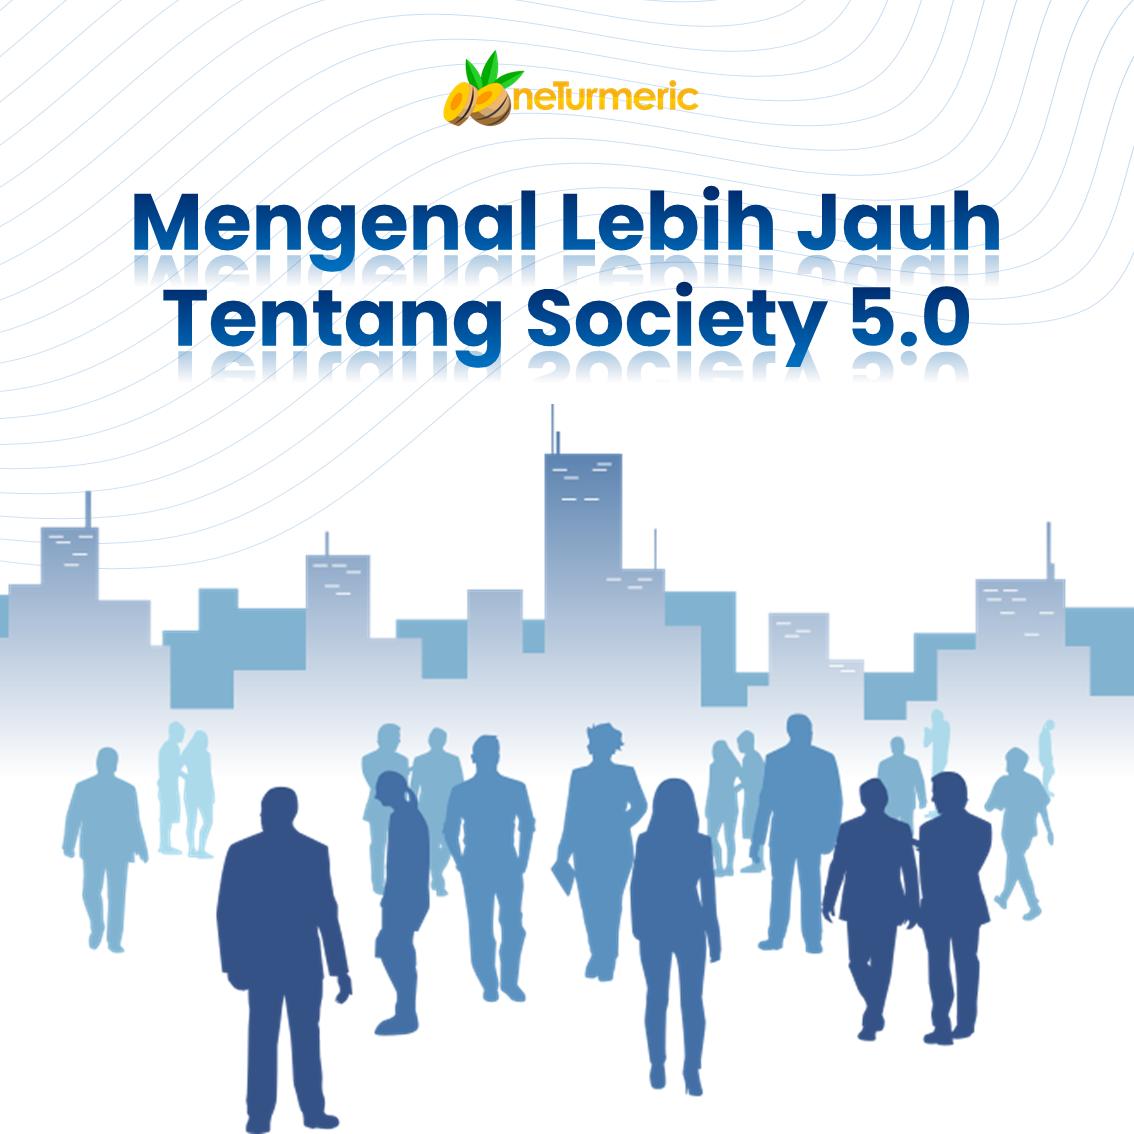 Mengenal Lebih Jauh Tentang Society 5.0